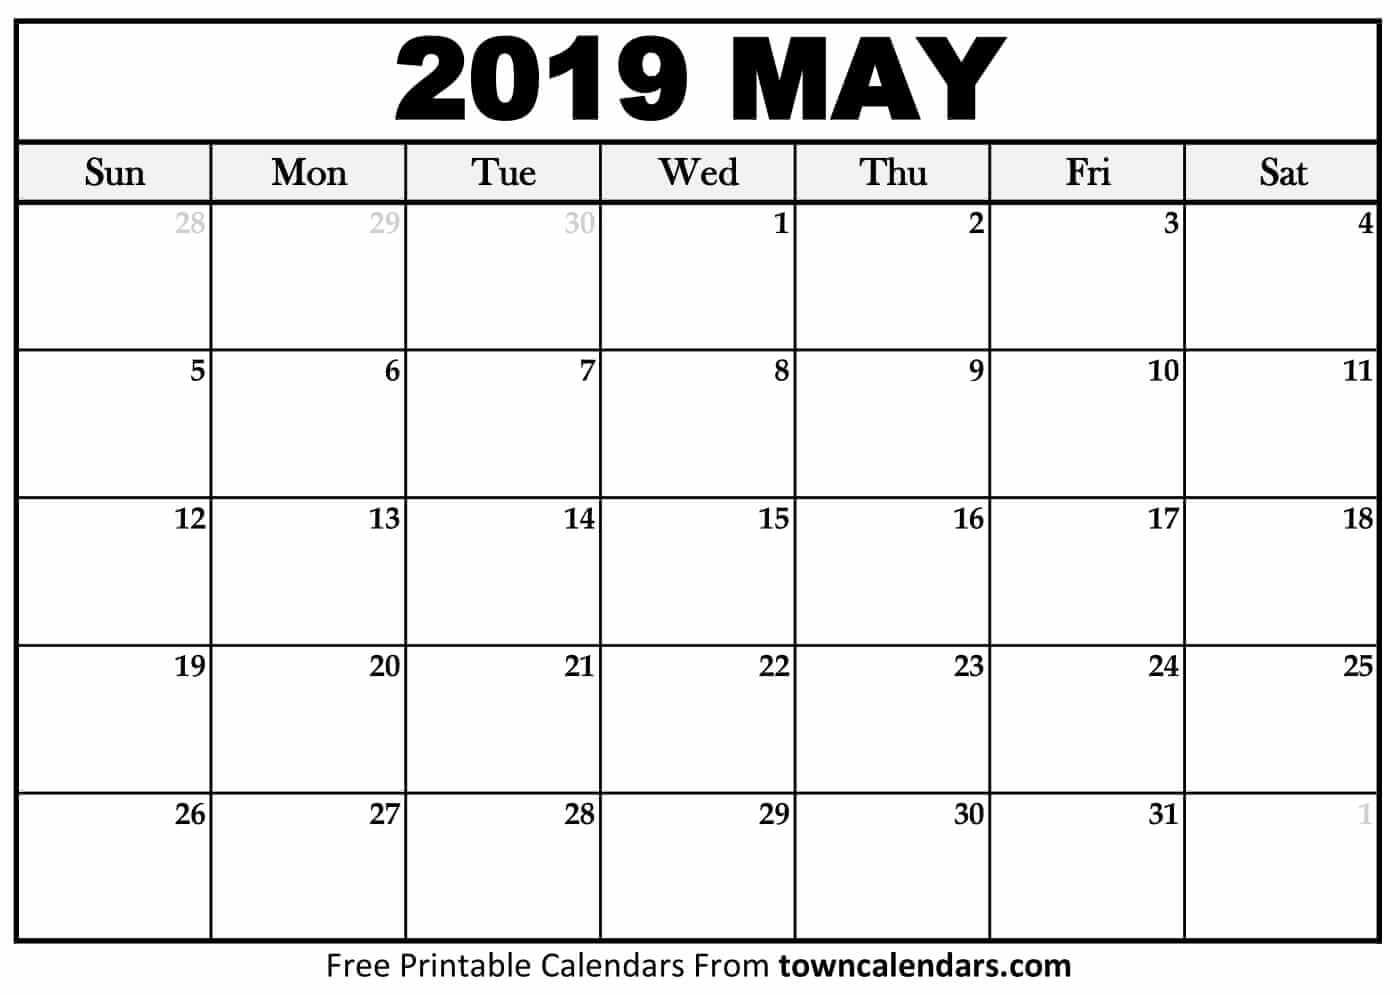 May Month Calendar 2019 Printable